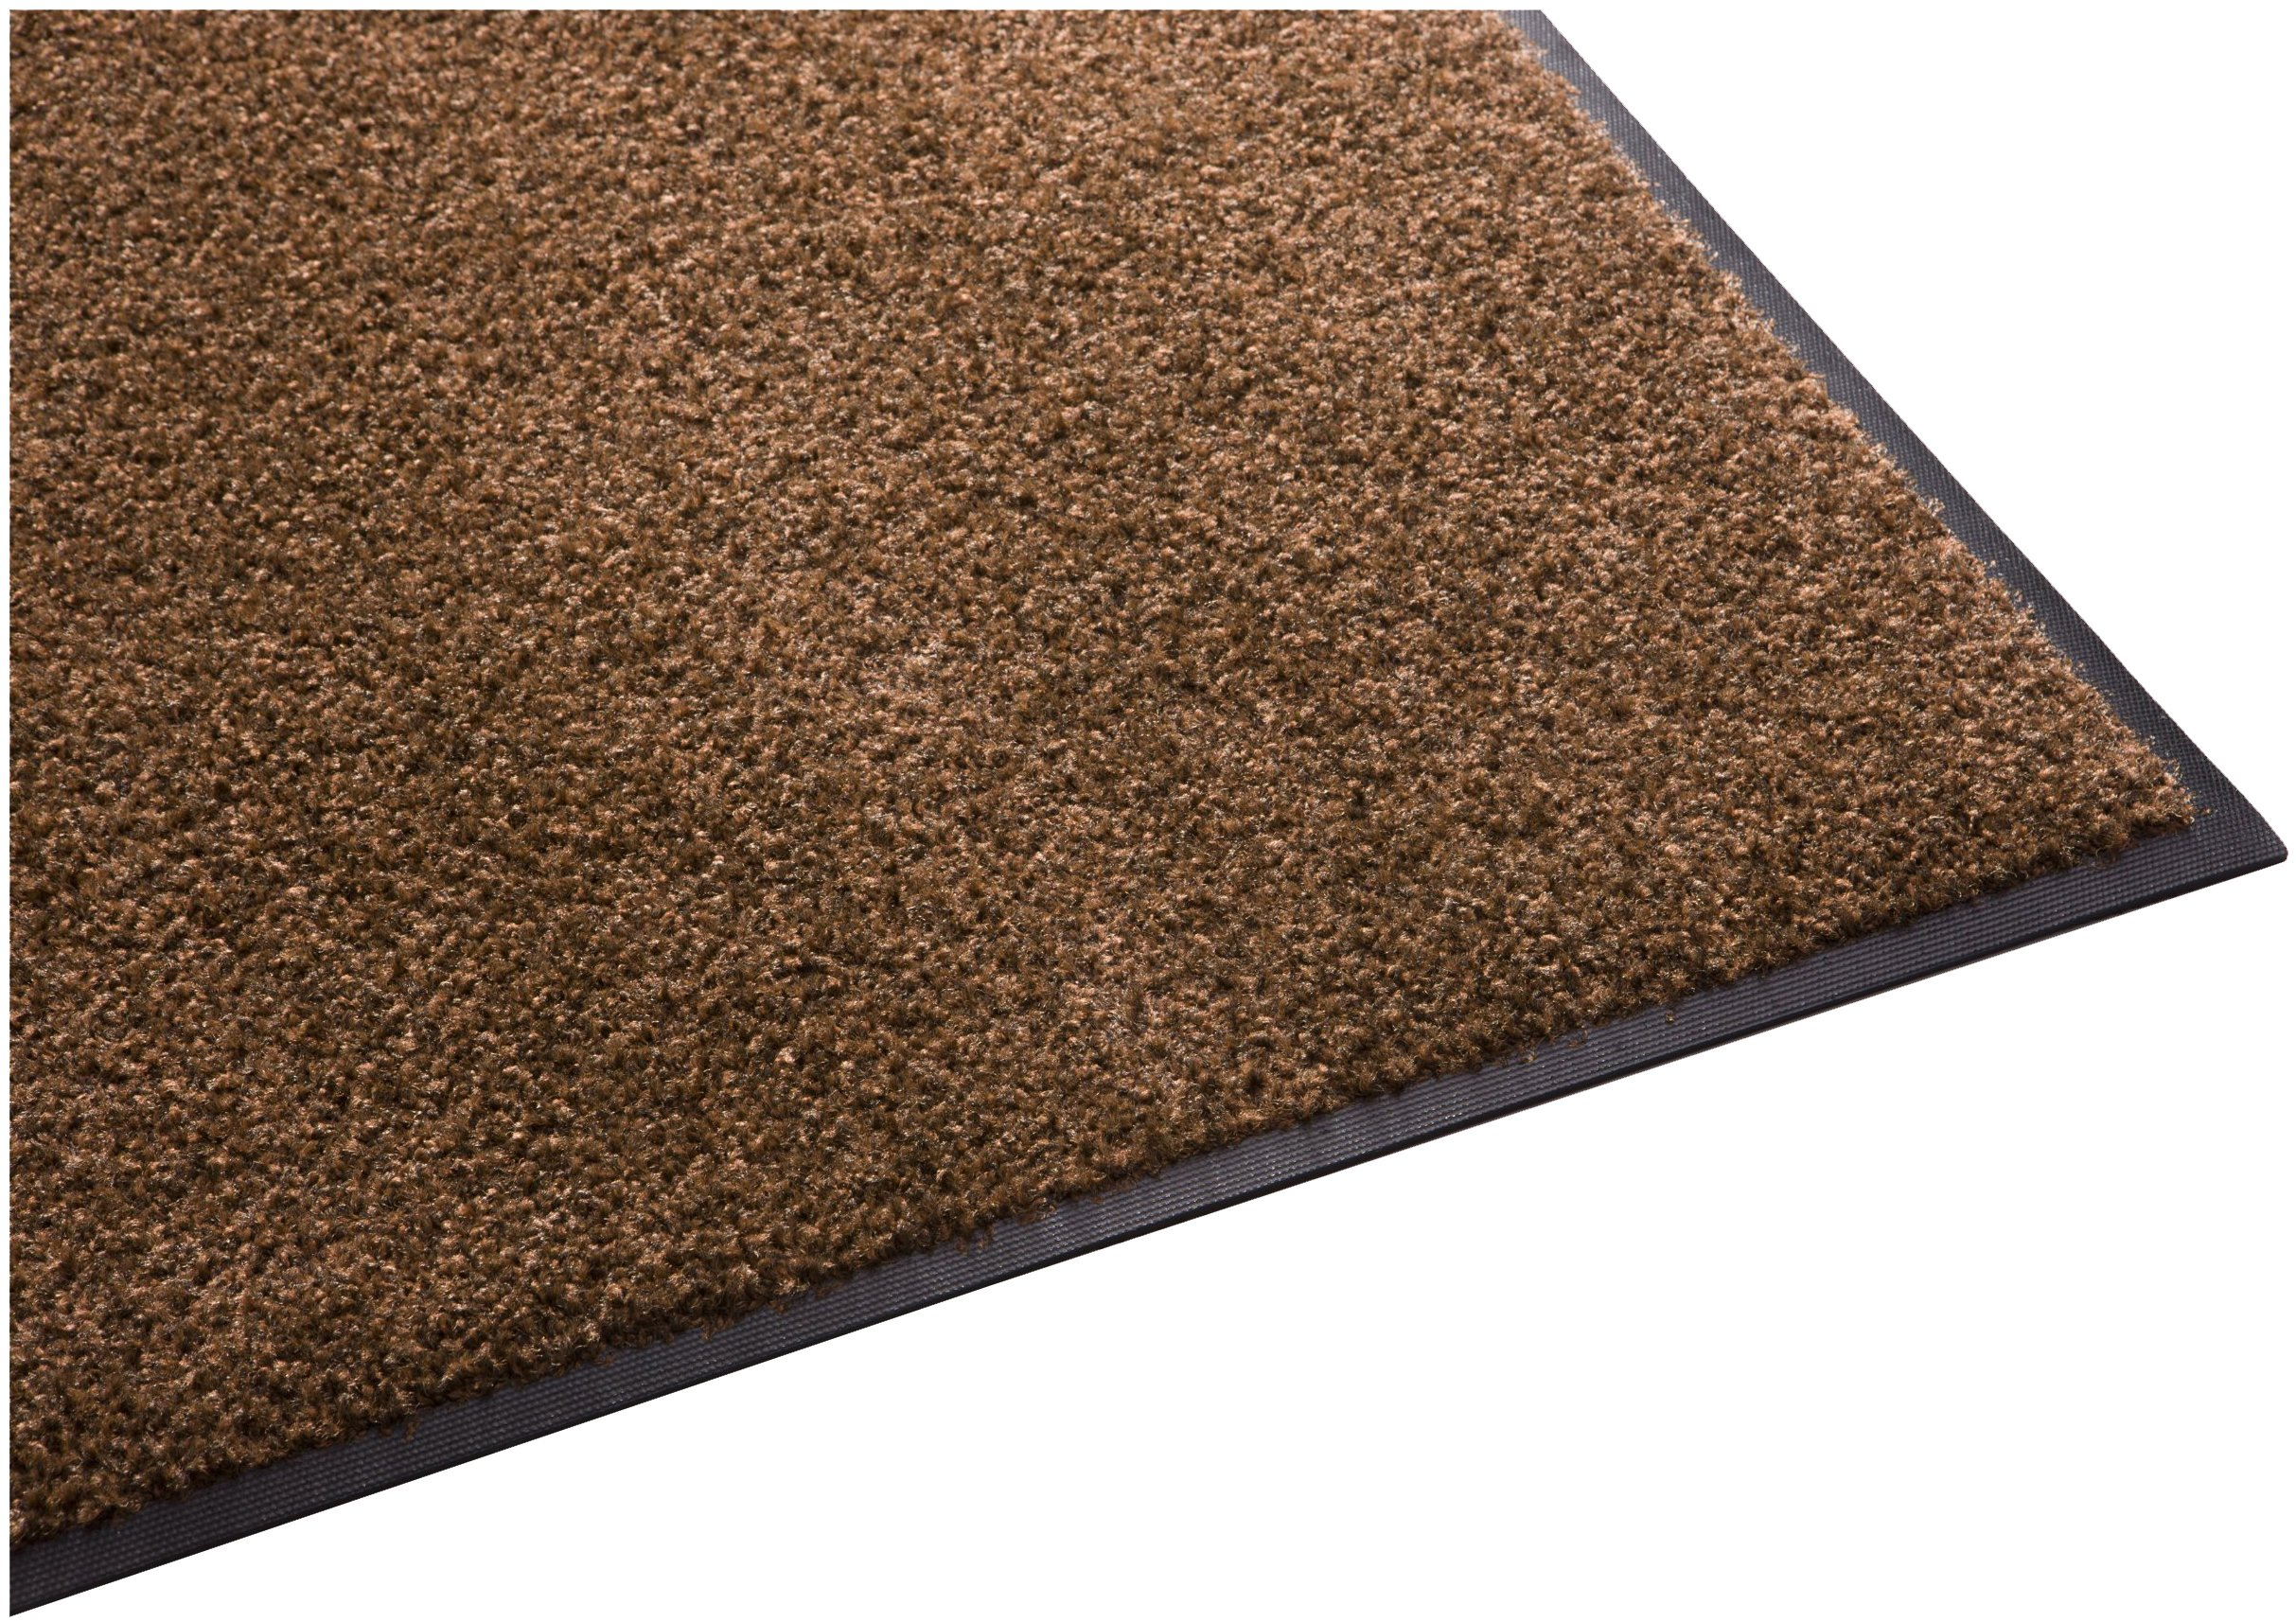 Guardian Platinum Series Indoor Wiper Floor Mat, Rubber with Nylon Carpet, 4'x11', Brown